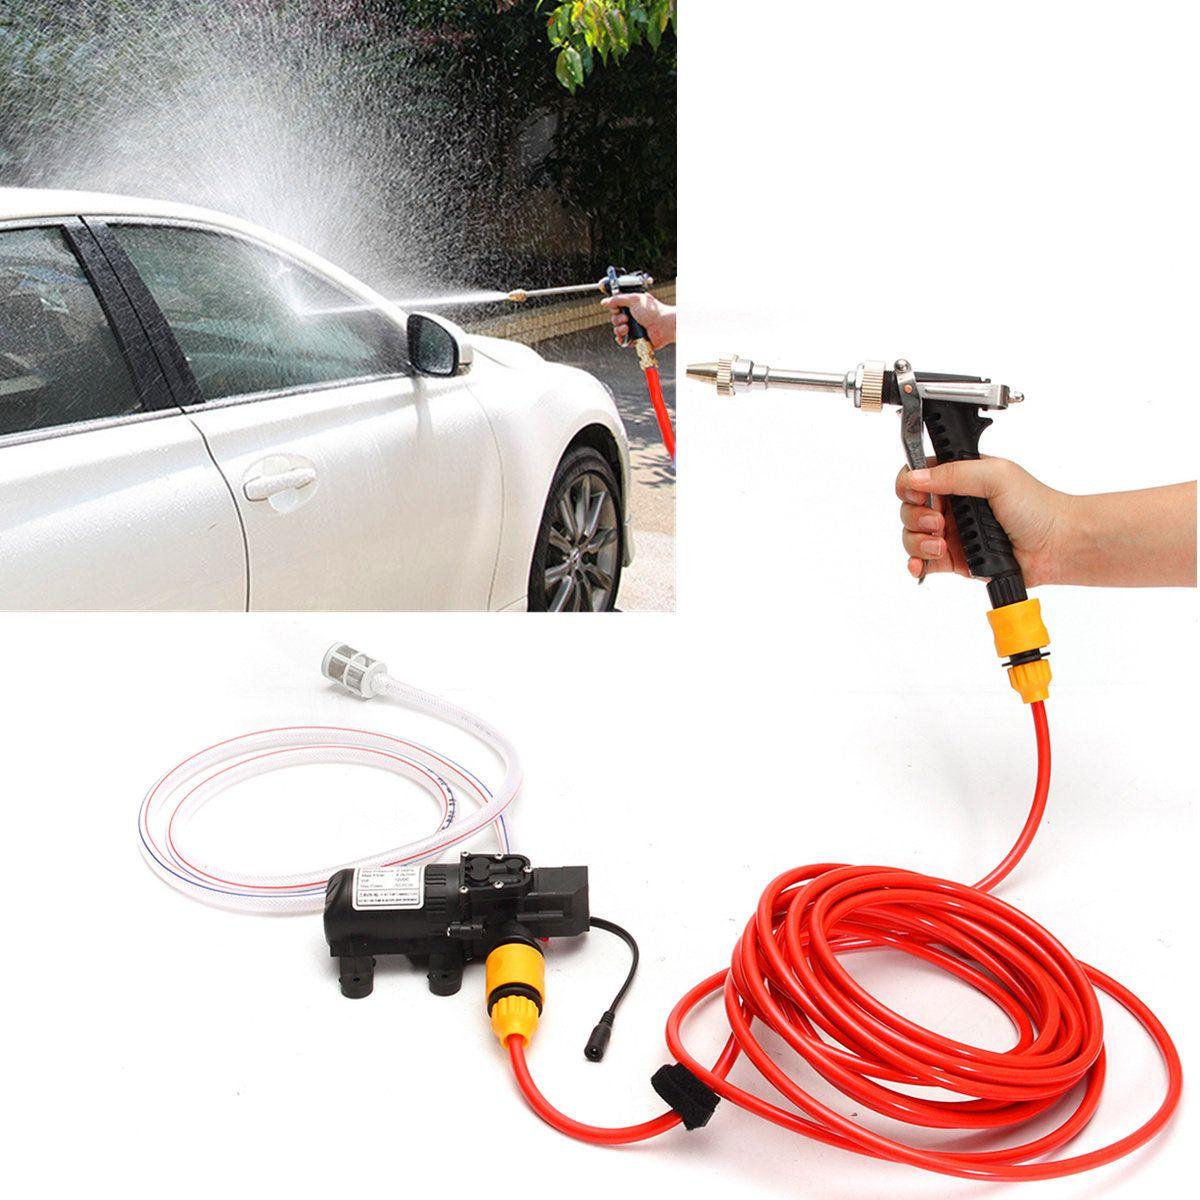 12v 65w High Pressure Marine Deck Car Washer Wash Water Pump Cleaner Sprayer Kit Car Repair Maintenance From Automobiles Motorcycles On Banggood Com Car Washer Repair And Maintenance Pumping Car